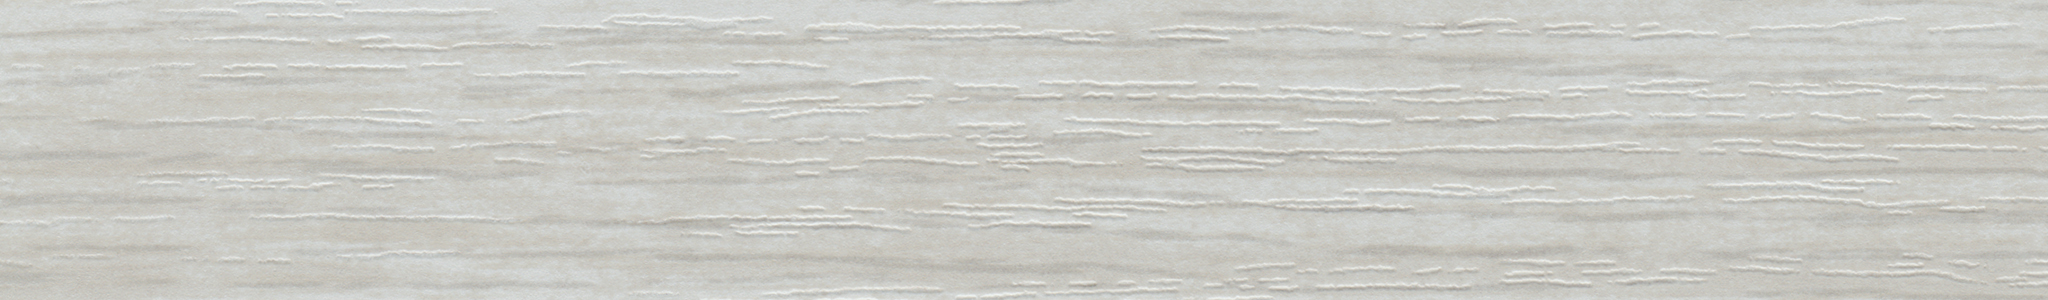 HD 246251 ABS Edge Oak Bari Grey Pore